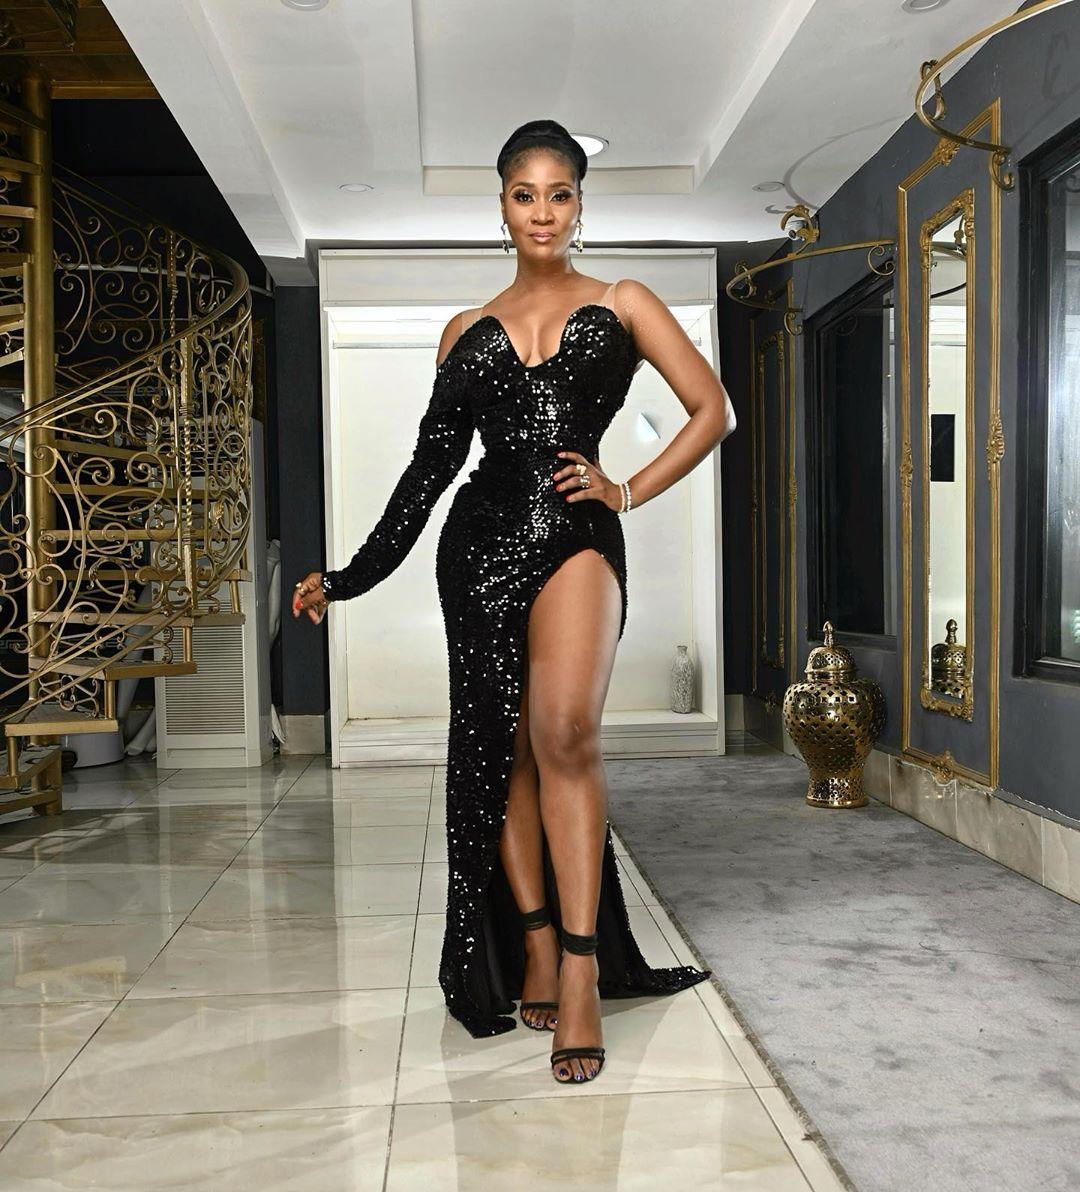 Toni Tones Split Gown Sets An Interesting fashion Trend